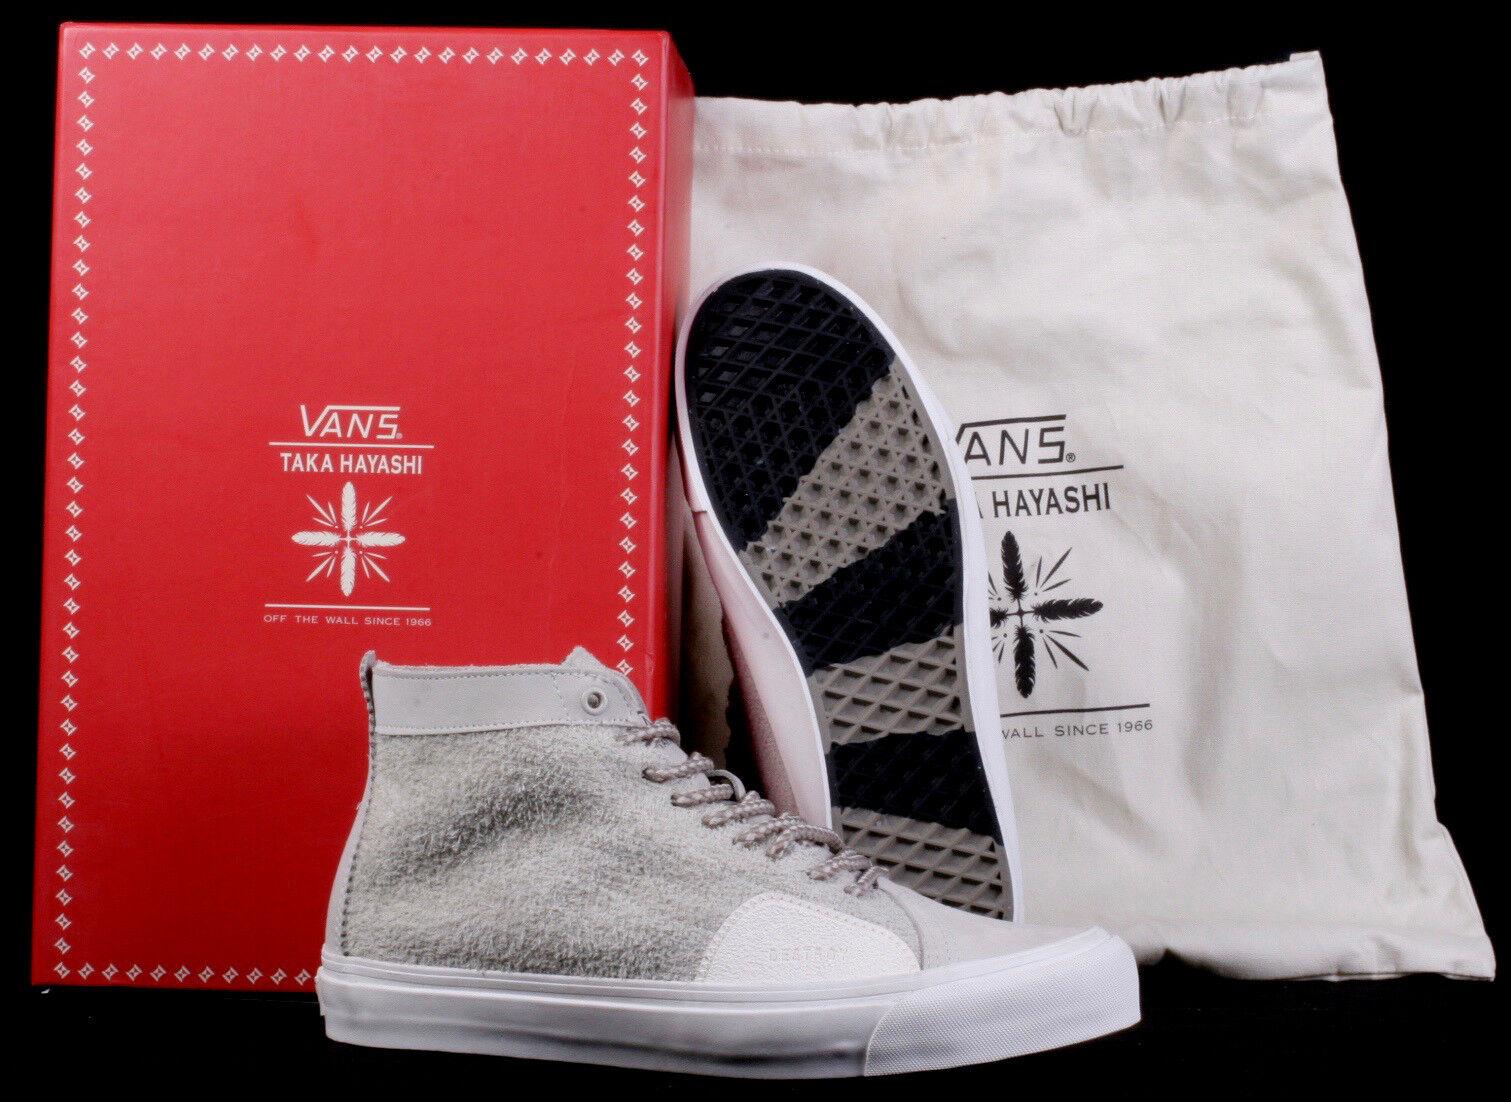 Vans Taka Hayashi TH SK8 Skool Nubuck Hairy Suede Grey Leather shoes - Size 11.5